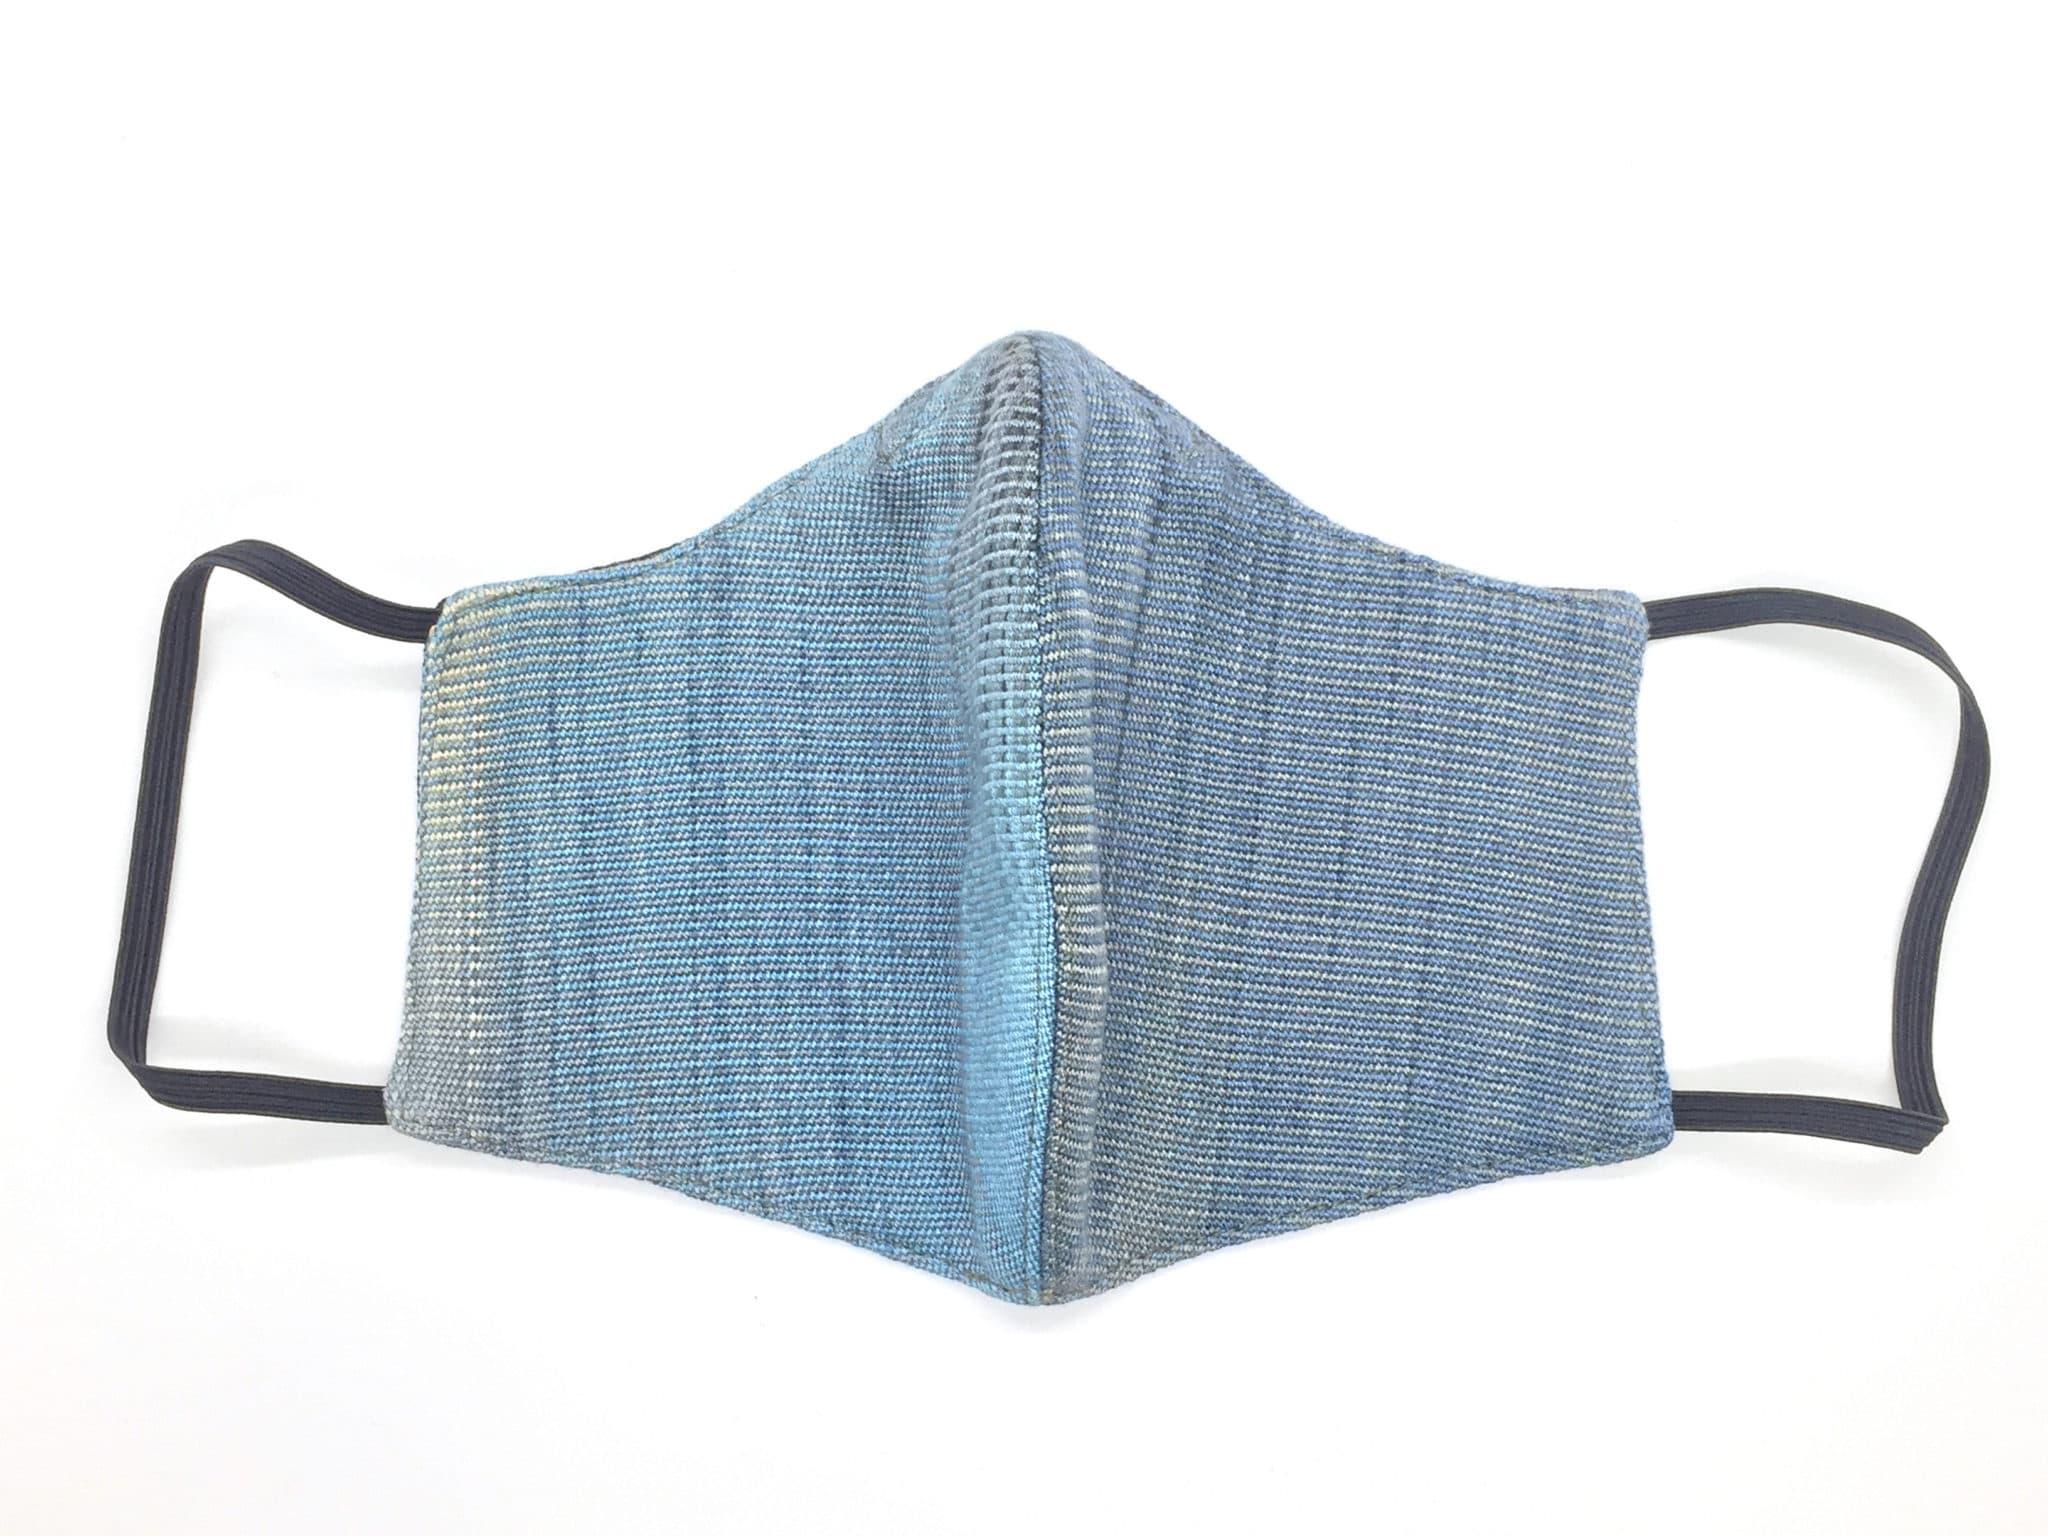 Handwoven Lightweight Bamboo Face Mask with Metal at Bridge of Nose - Denim - Blue, Black, Cream, Gray